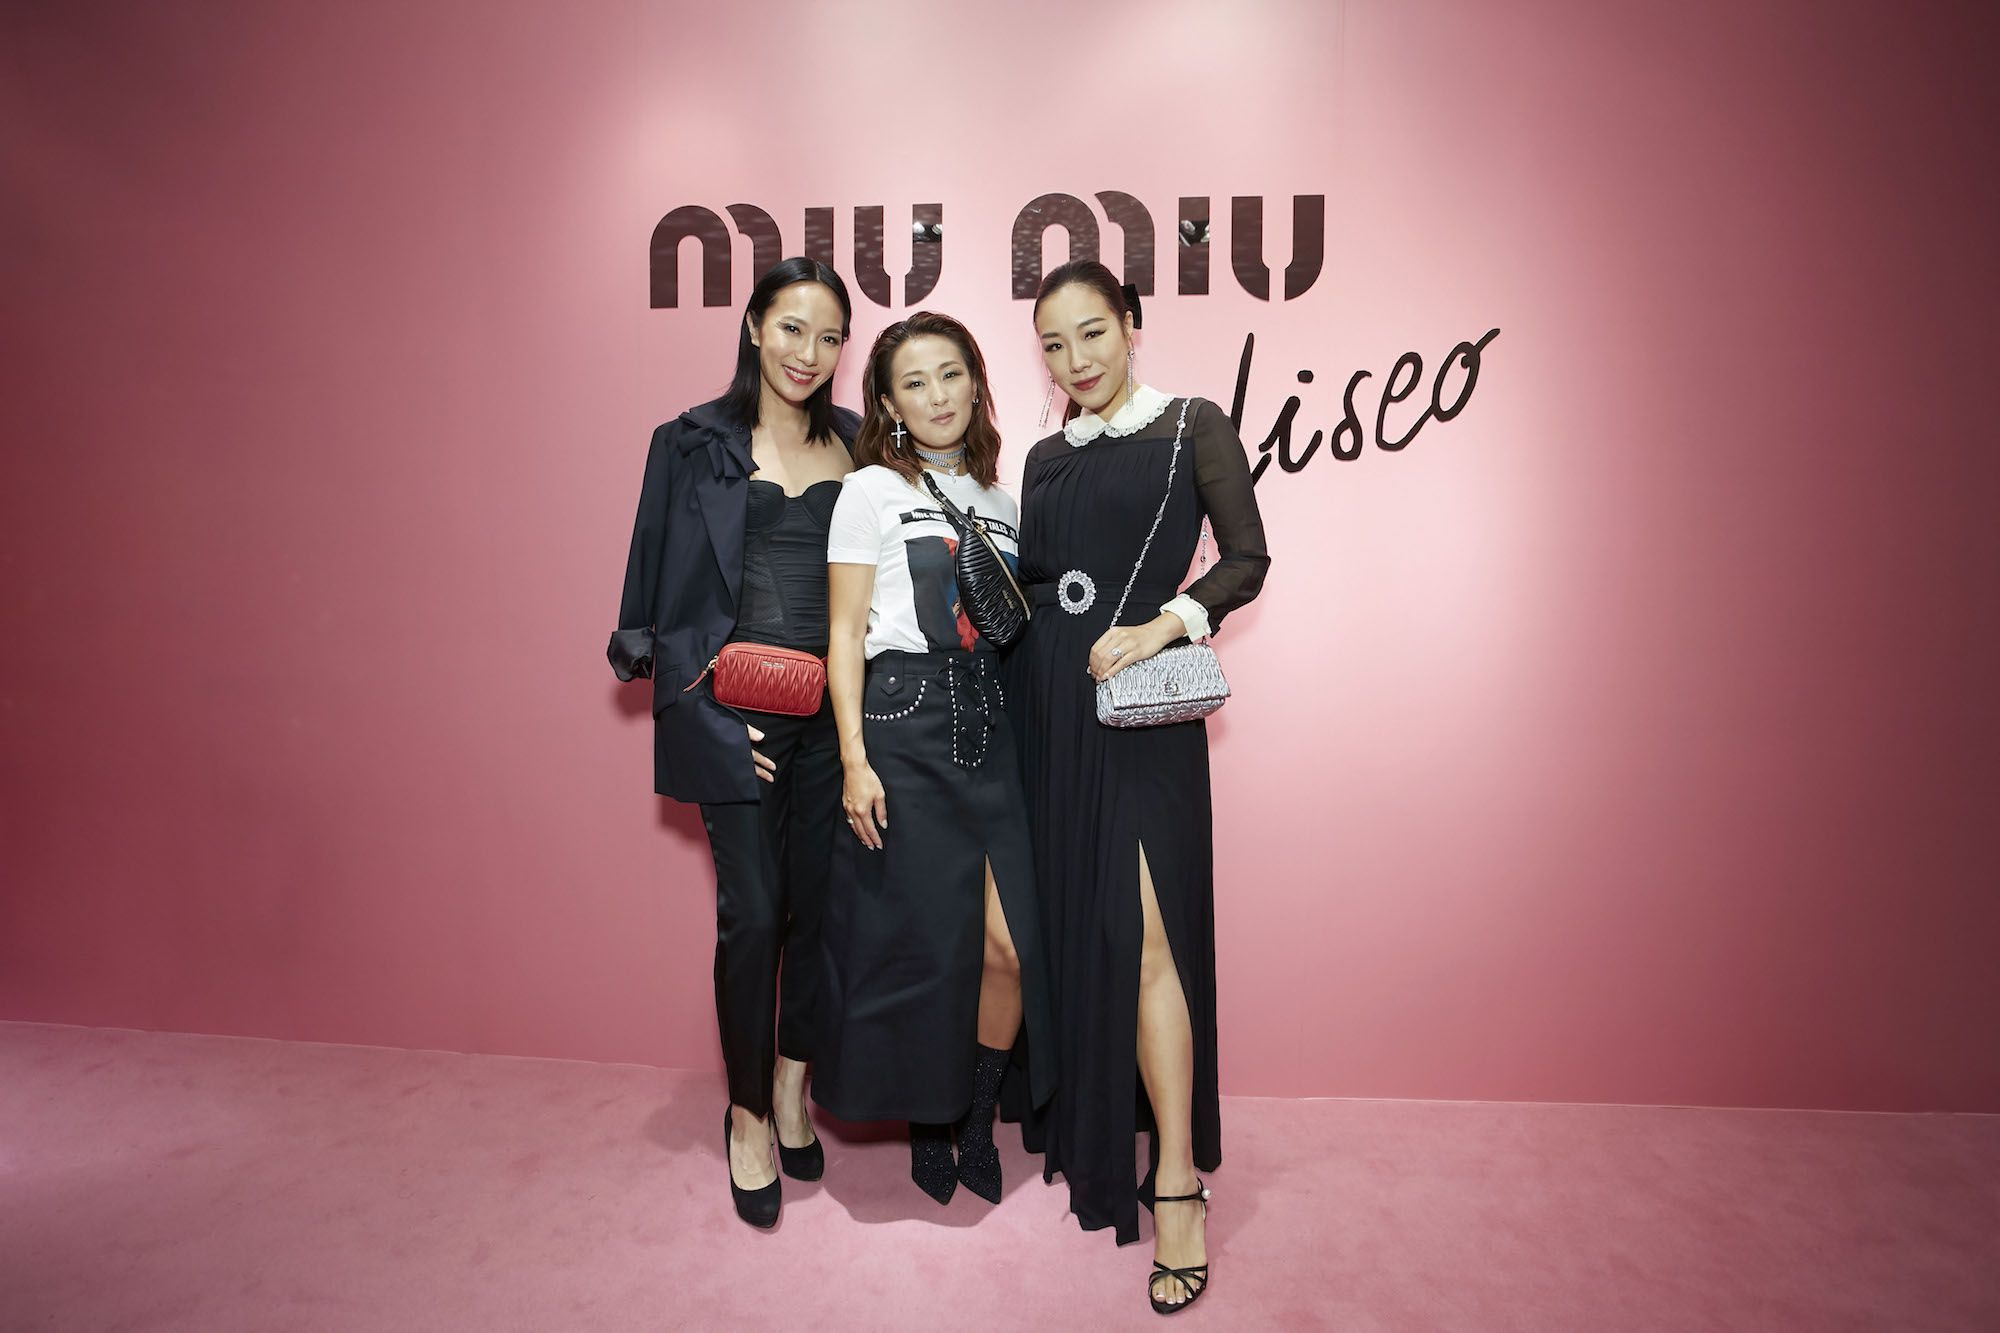 Jaime Ku, Antonia Li, Feiping Chang